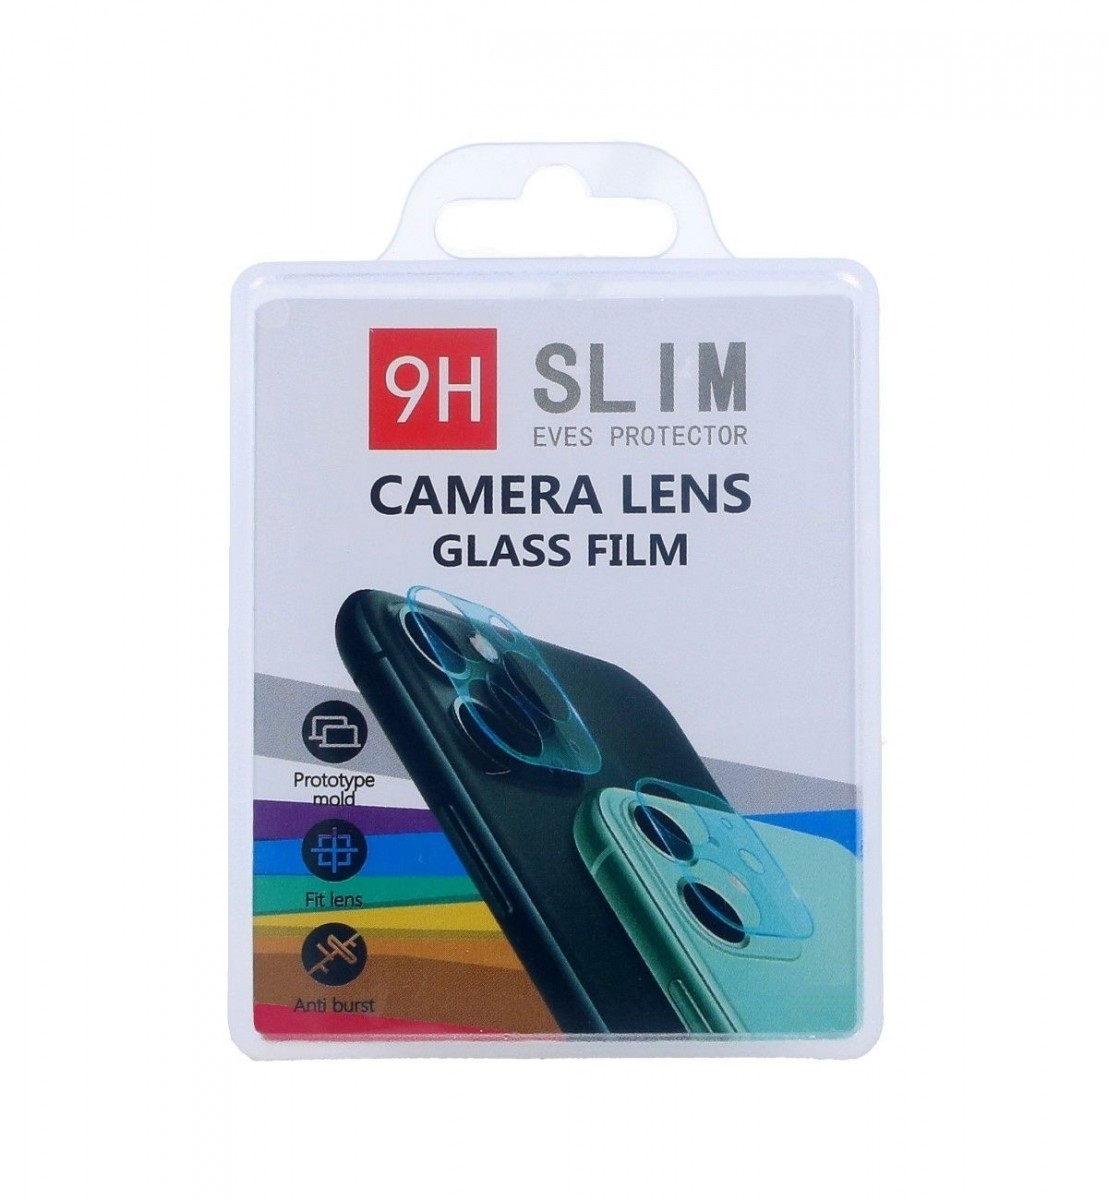 Tvrzené sklo TopQ na zadní fotoaparát Samsung S20+ 54777 (ochranné sklo na zadní čočku fotoaparátu Samsung S20+)